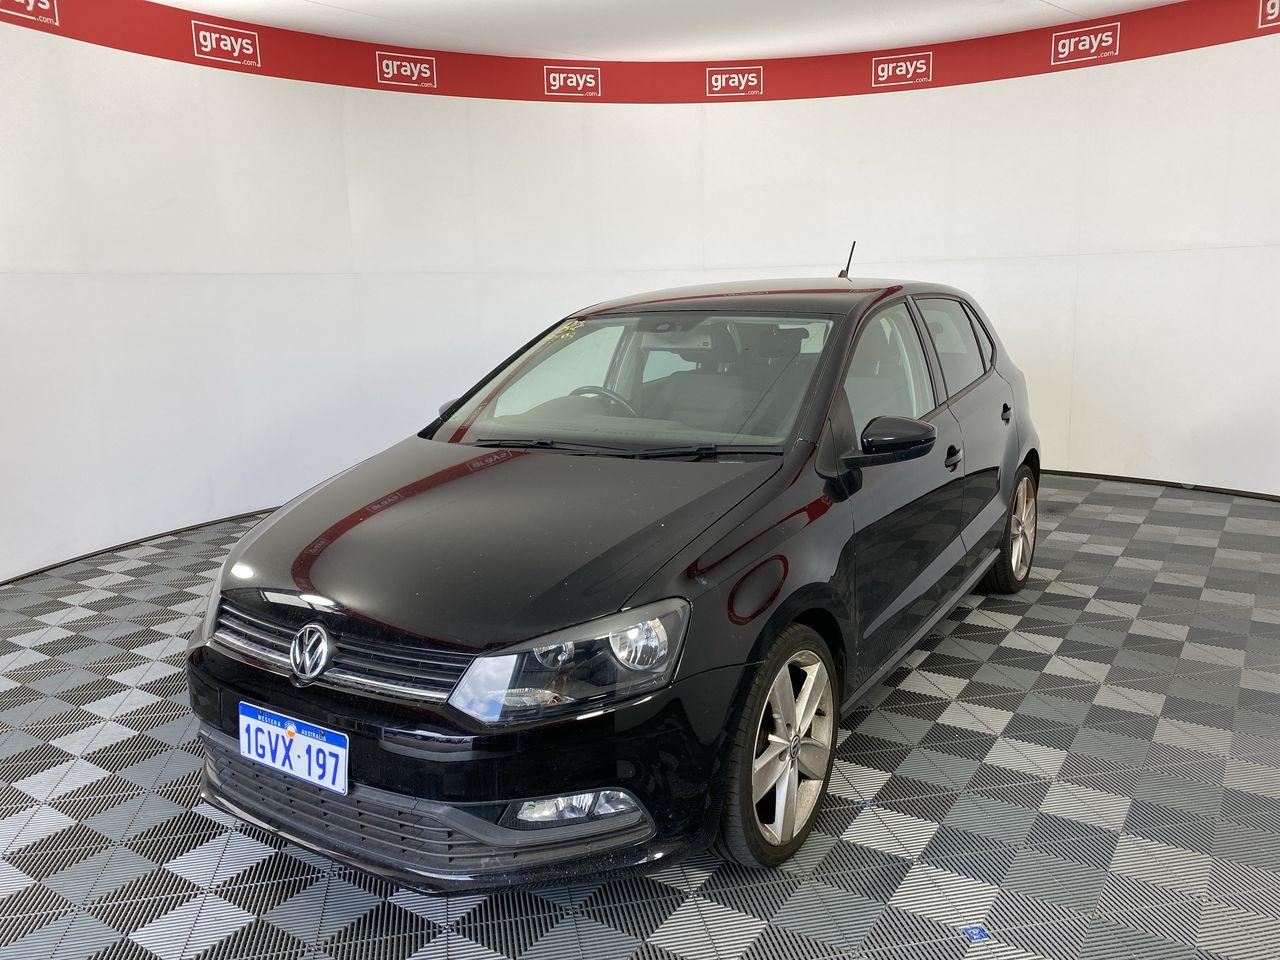 2012 Volkswagen Polo 77TSI COMFORTLINE 6R Auto Hatchback (WOVR-Inspected)